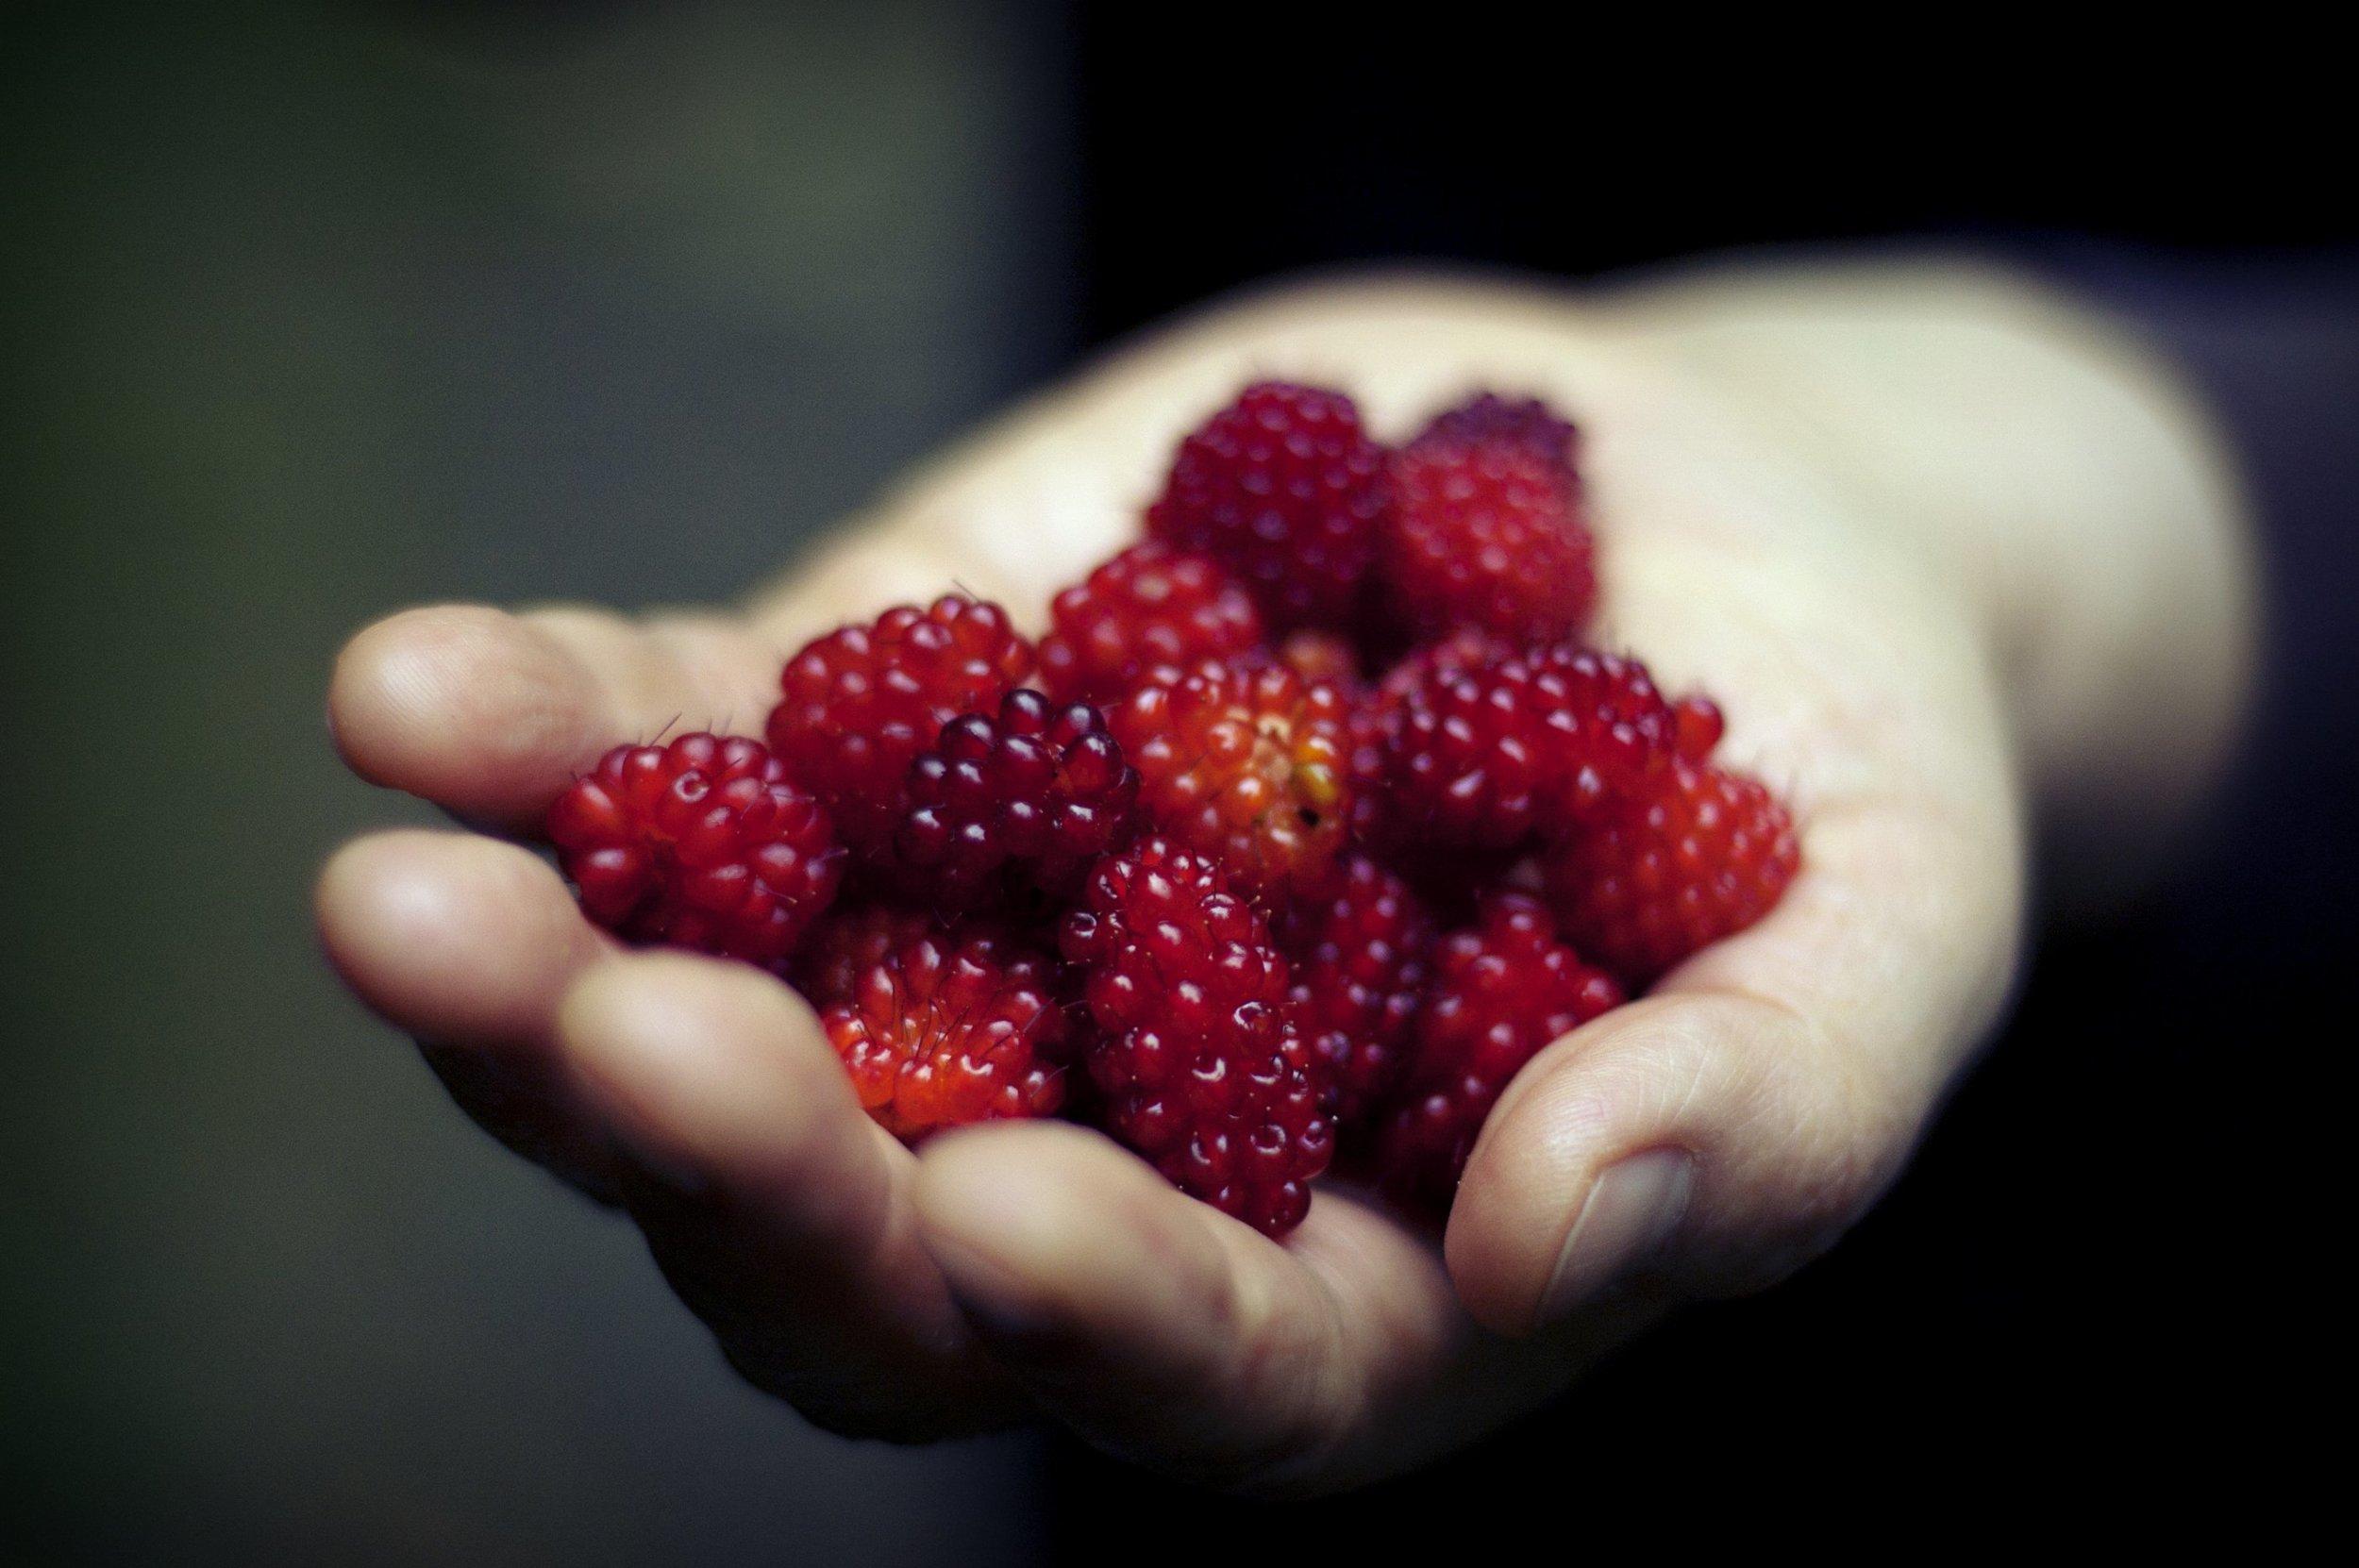 raspberries-hand.jpg